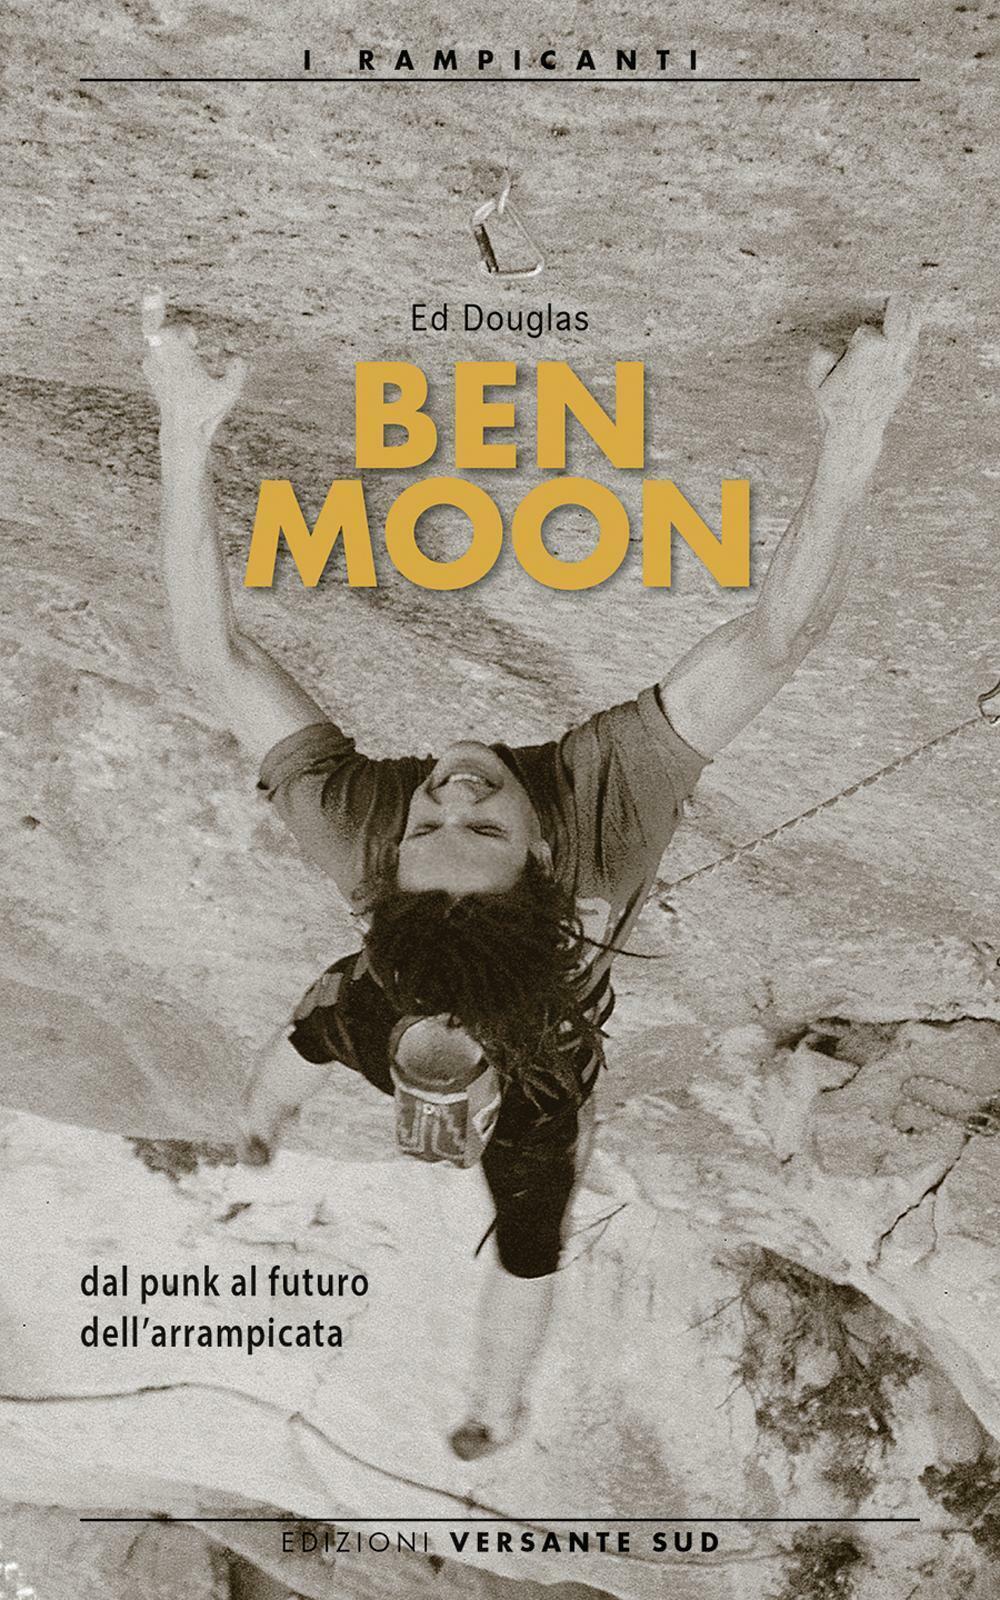 Ben Moon dal punk al futuro arrampicata - Douglas Ed